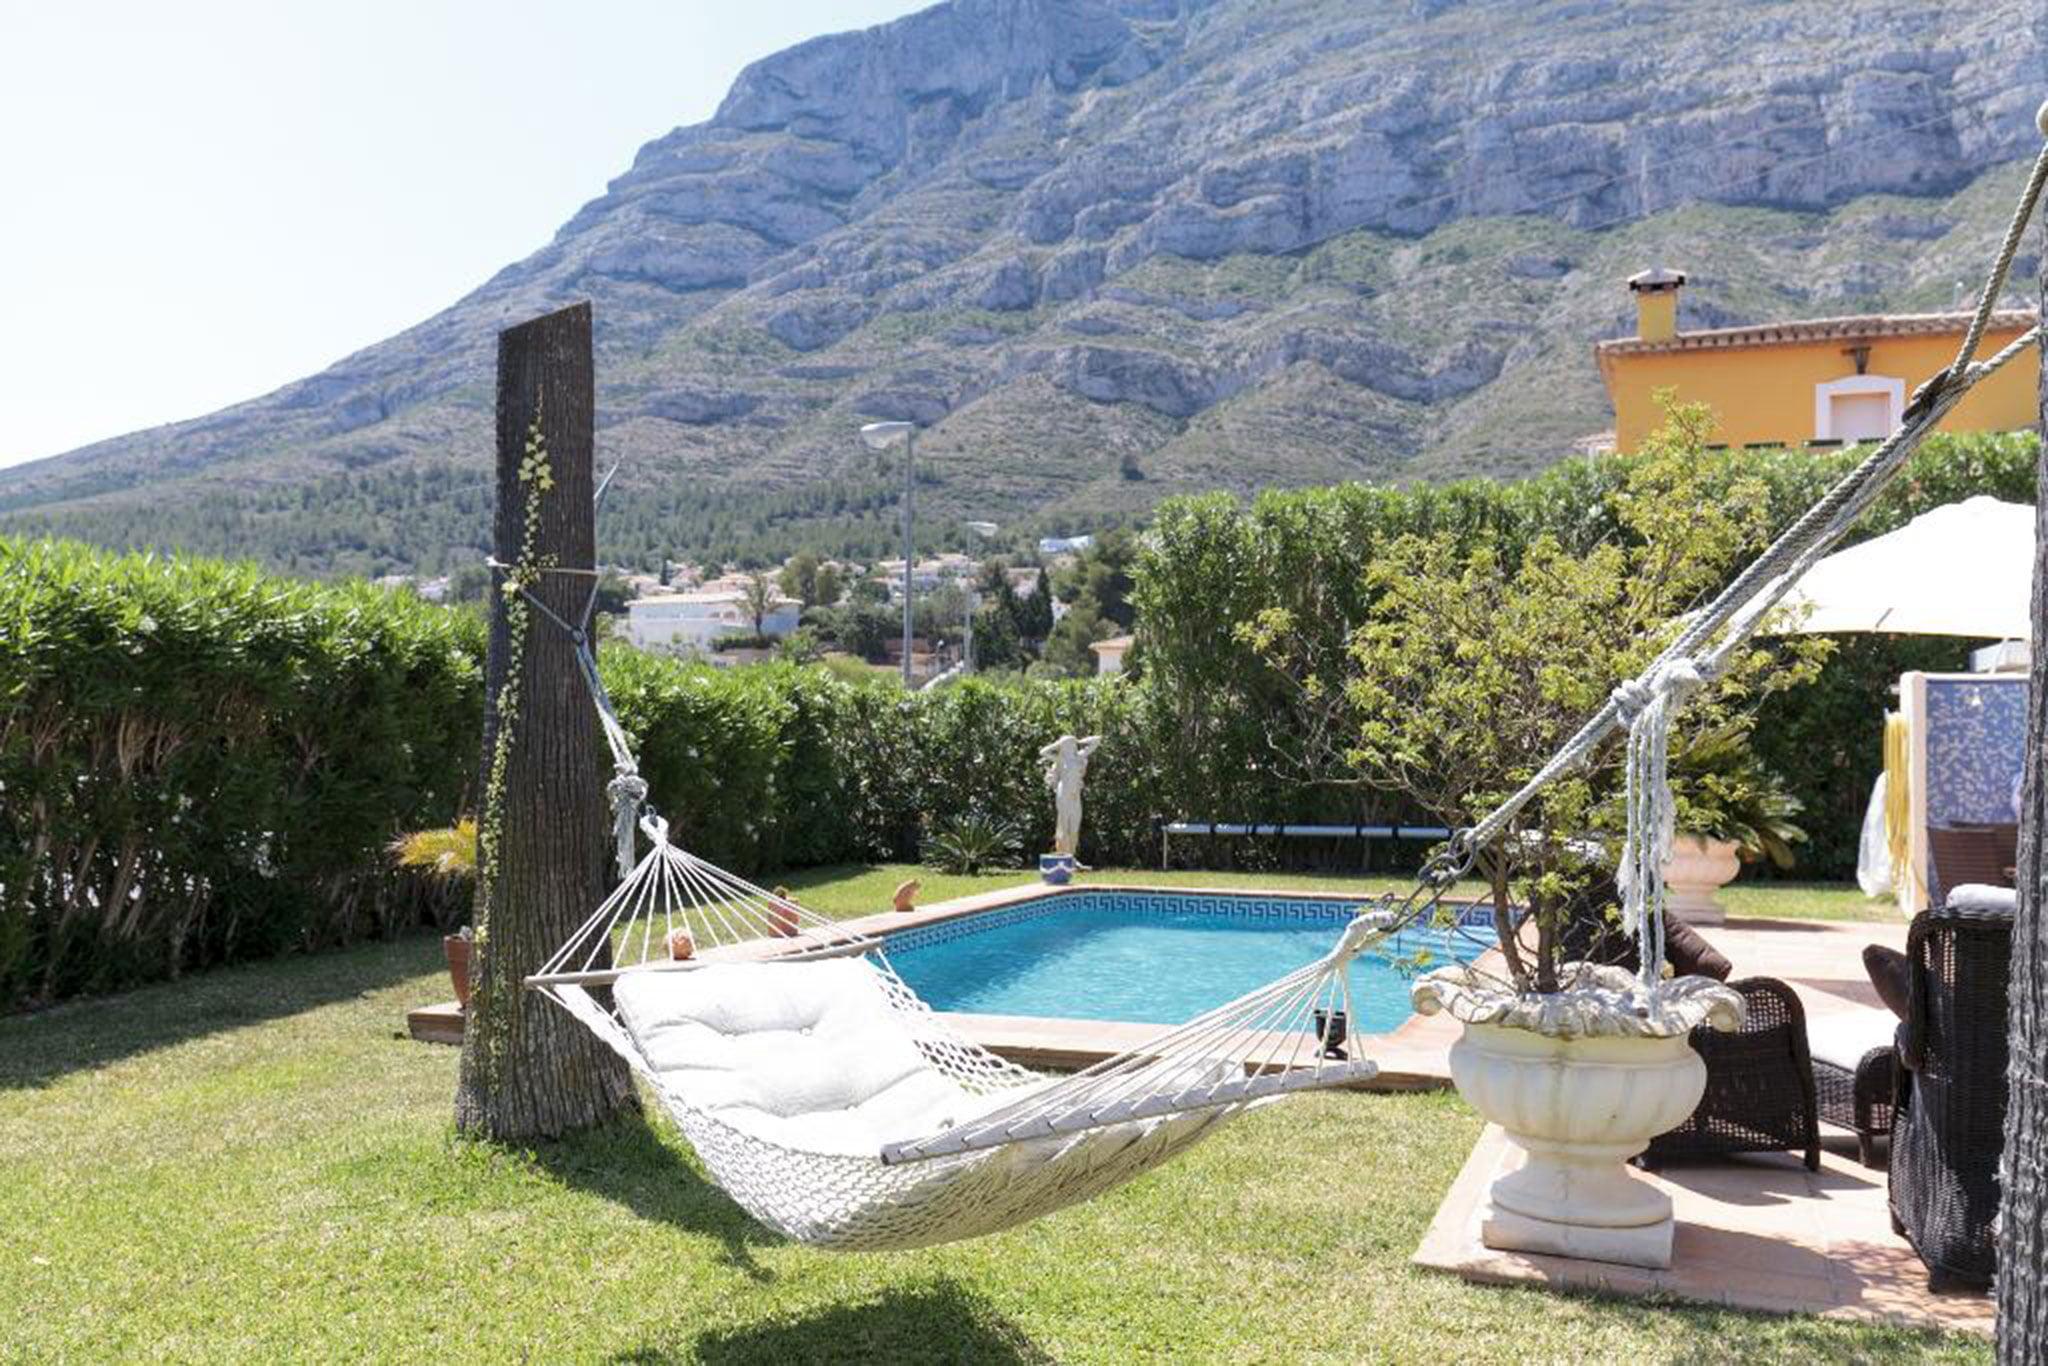 Piscina y tumbona en una casa en alquiler vacacional en Dénia – Quality Rent a Villa